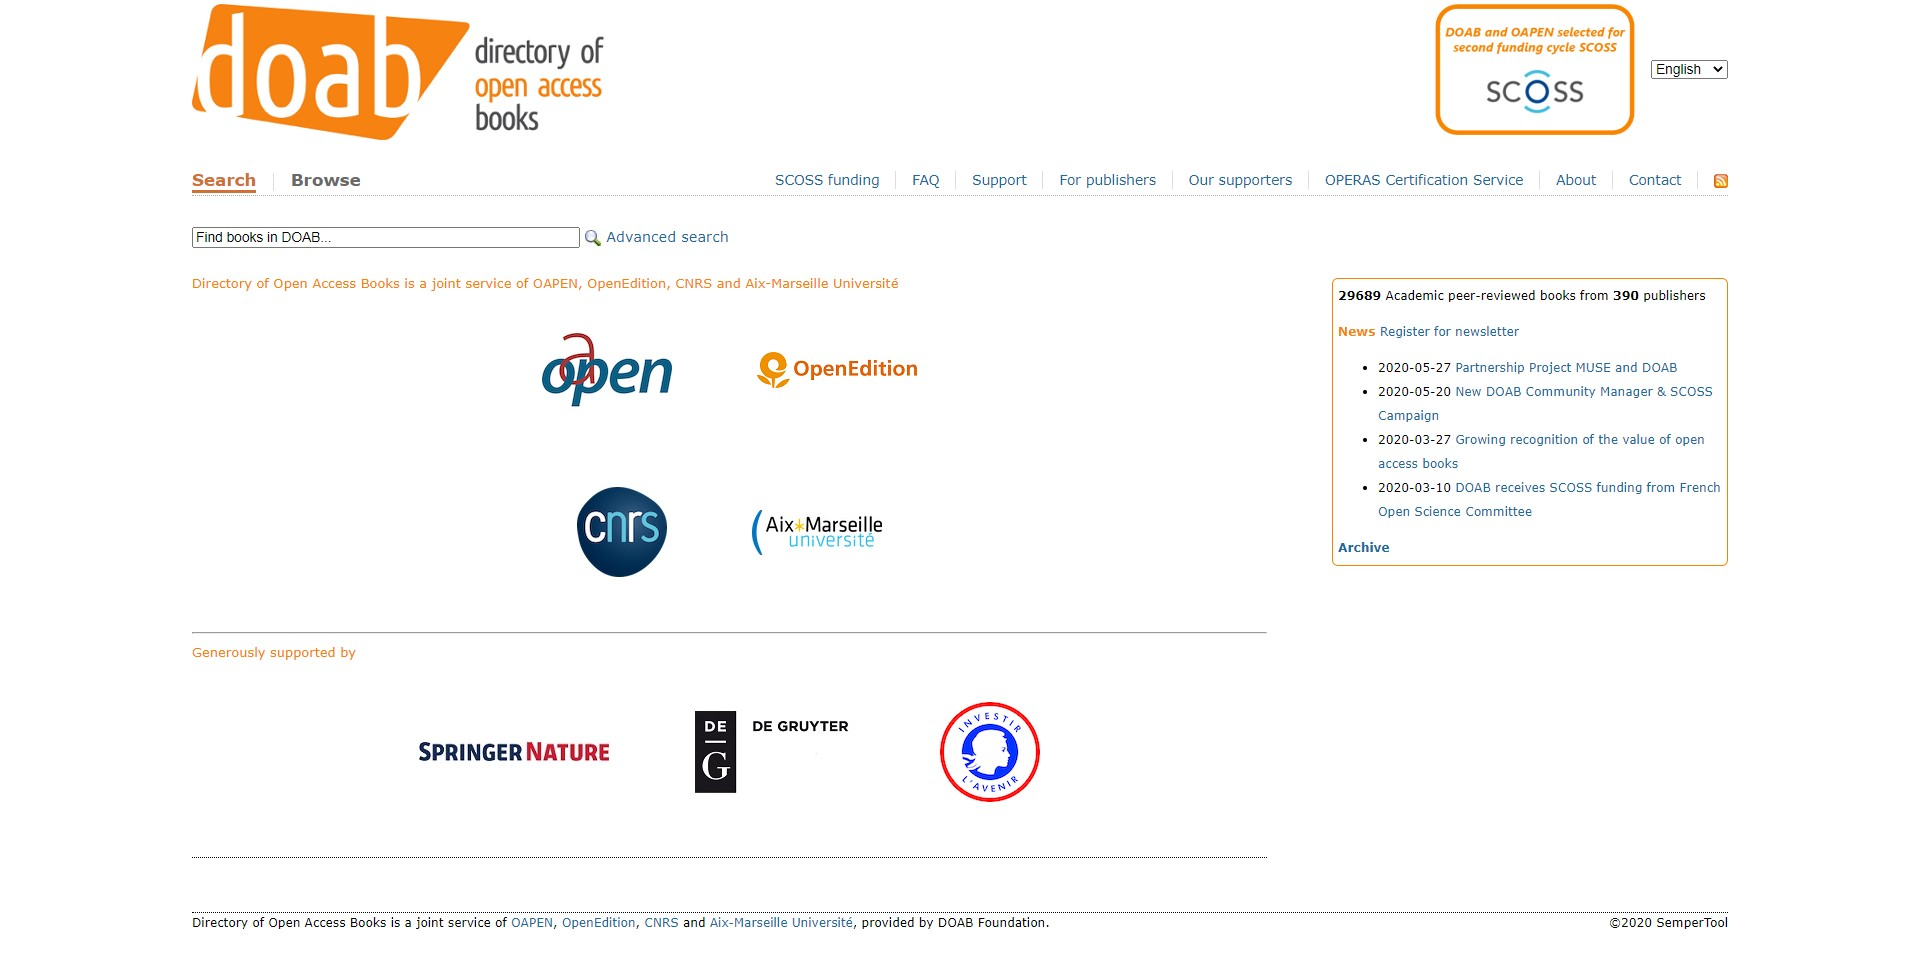 doabooks.org free college textbooks website